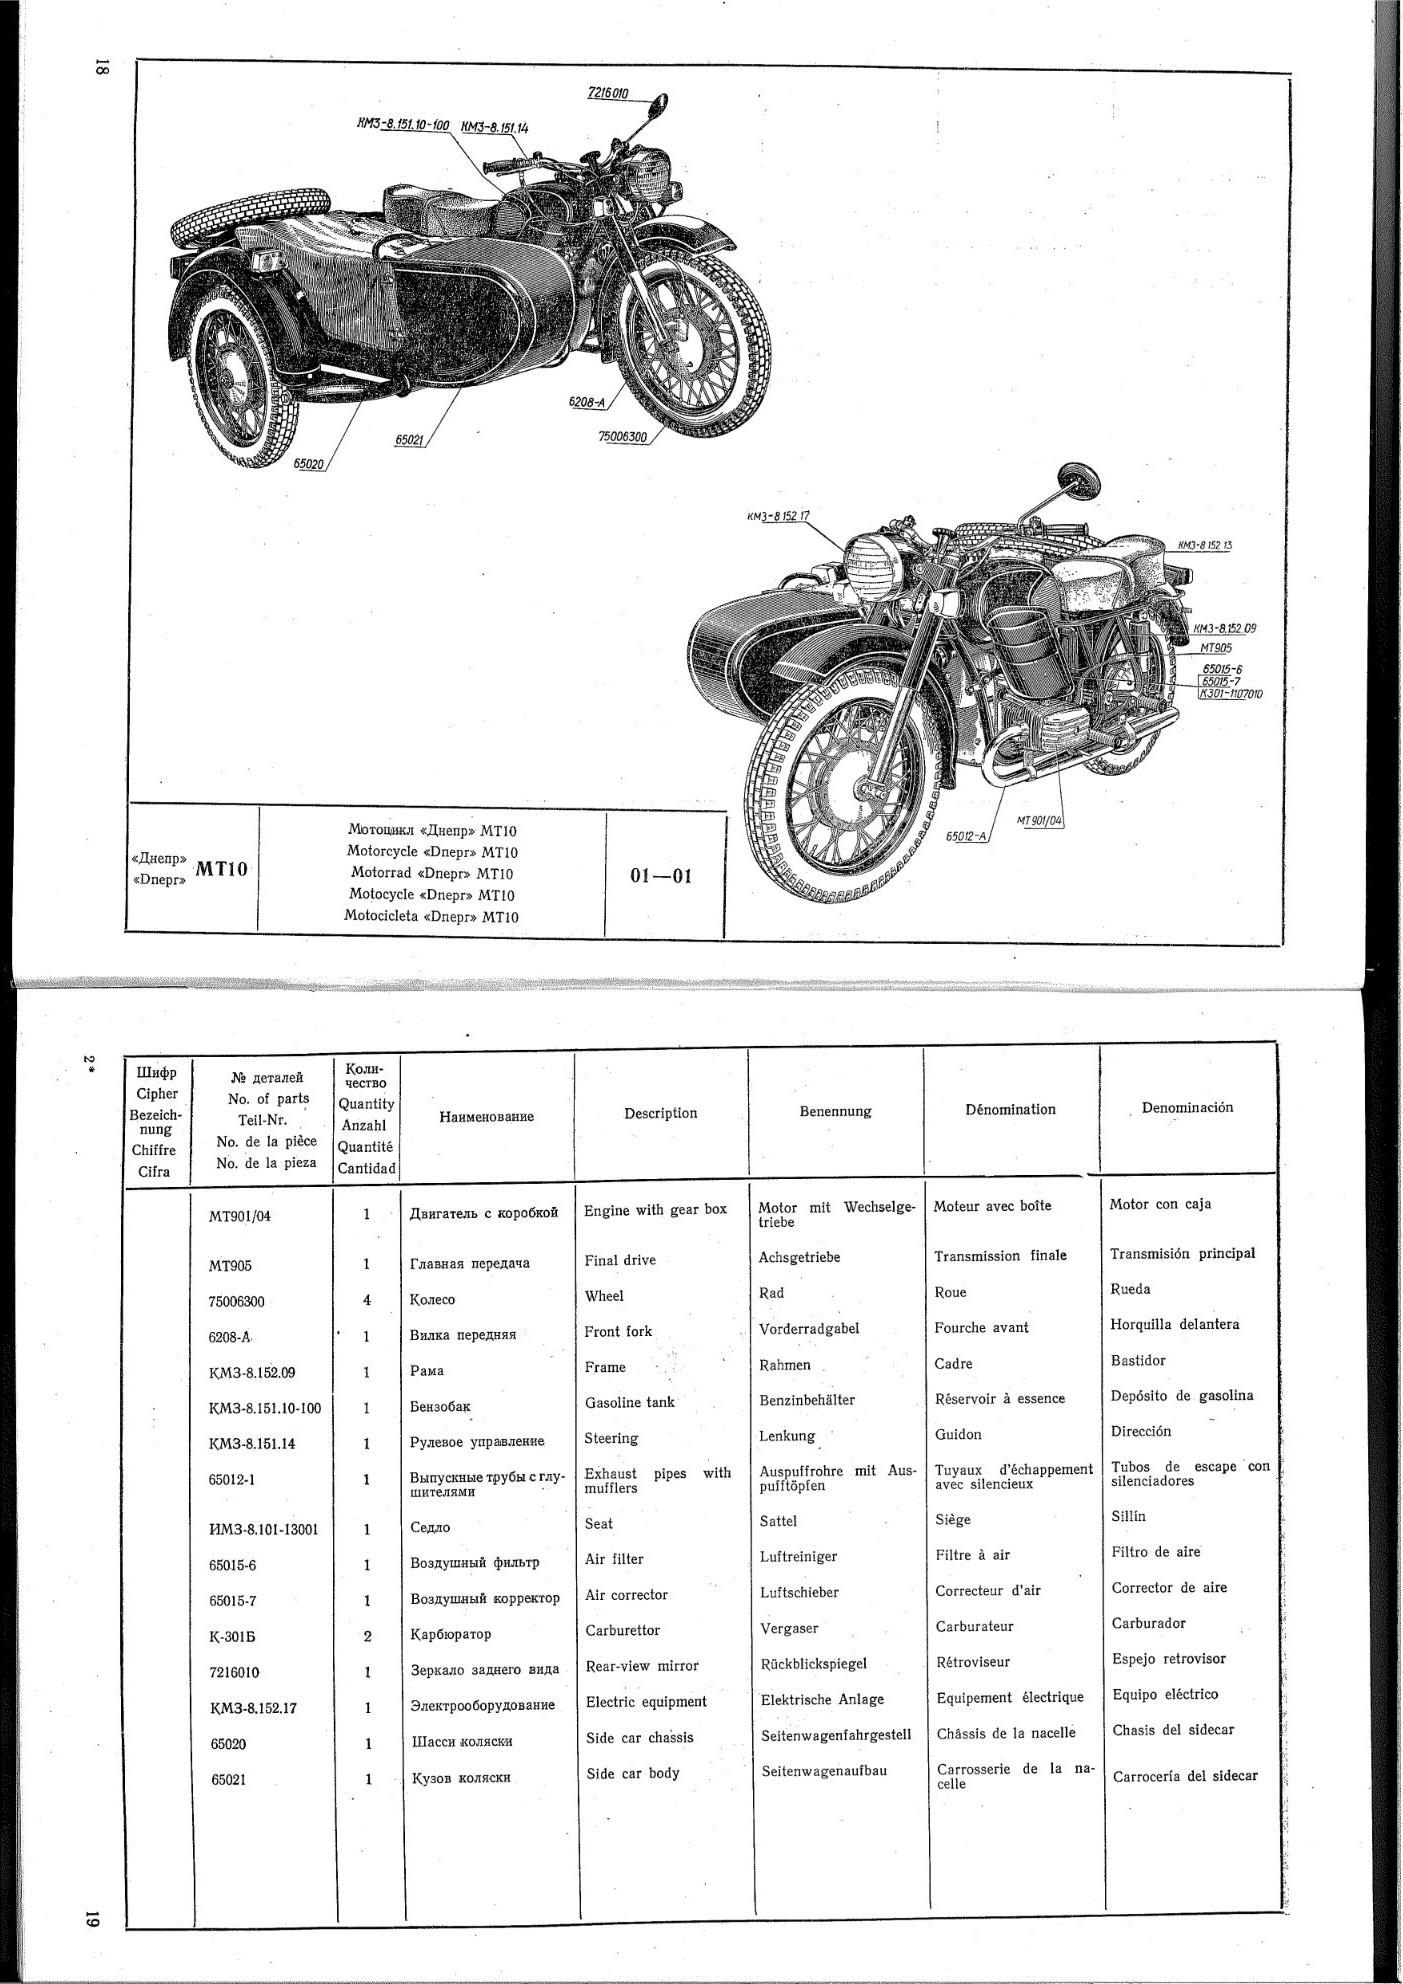 mt 07 service manual pdf